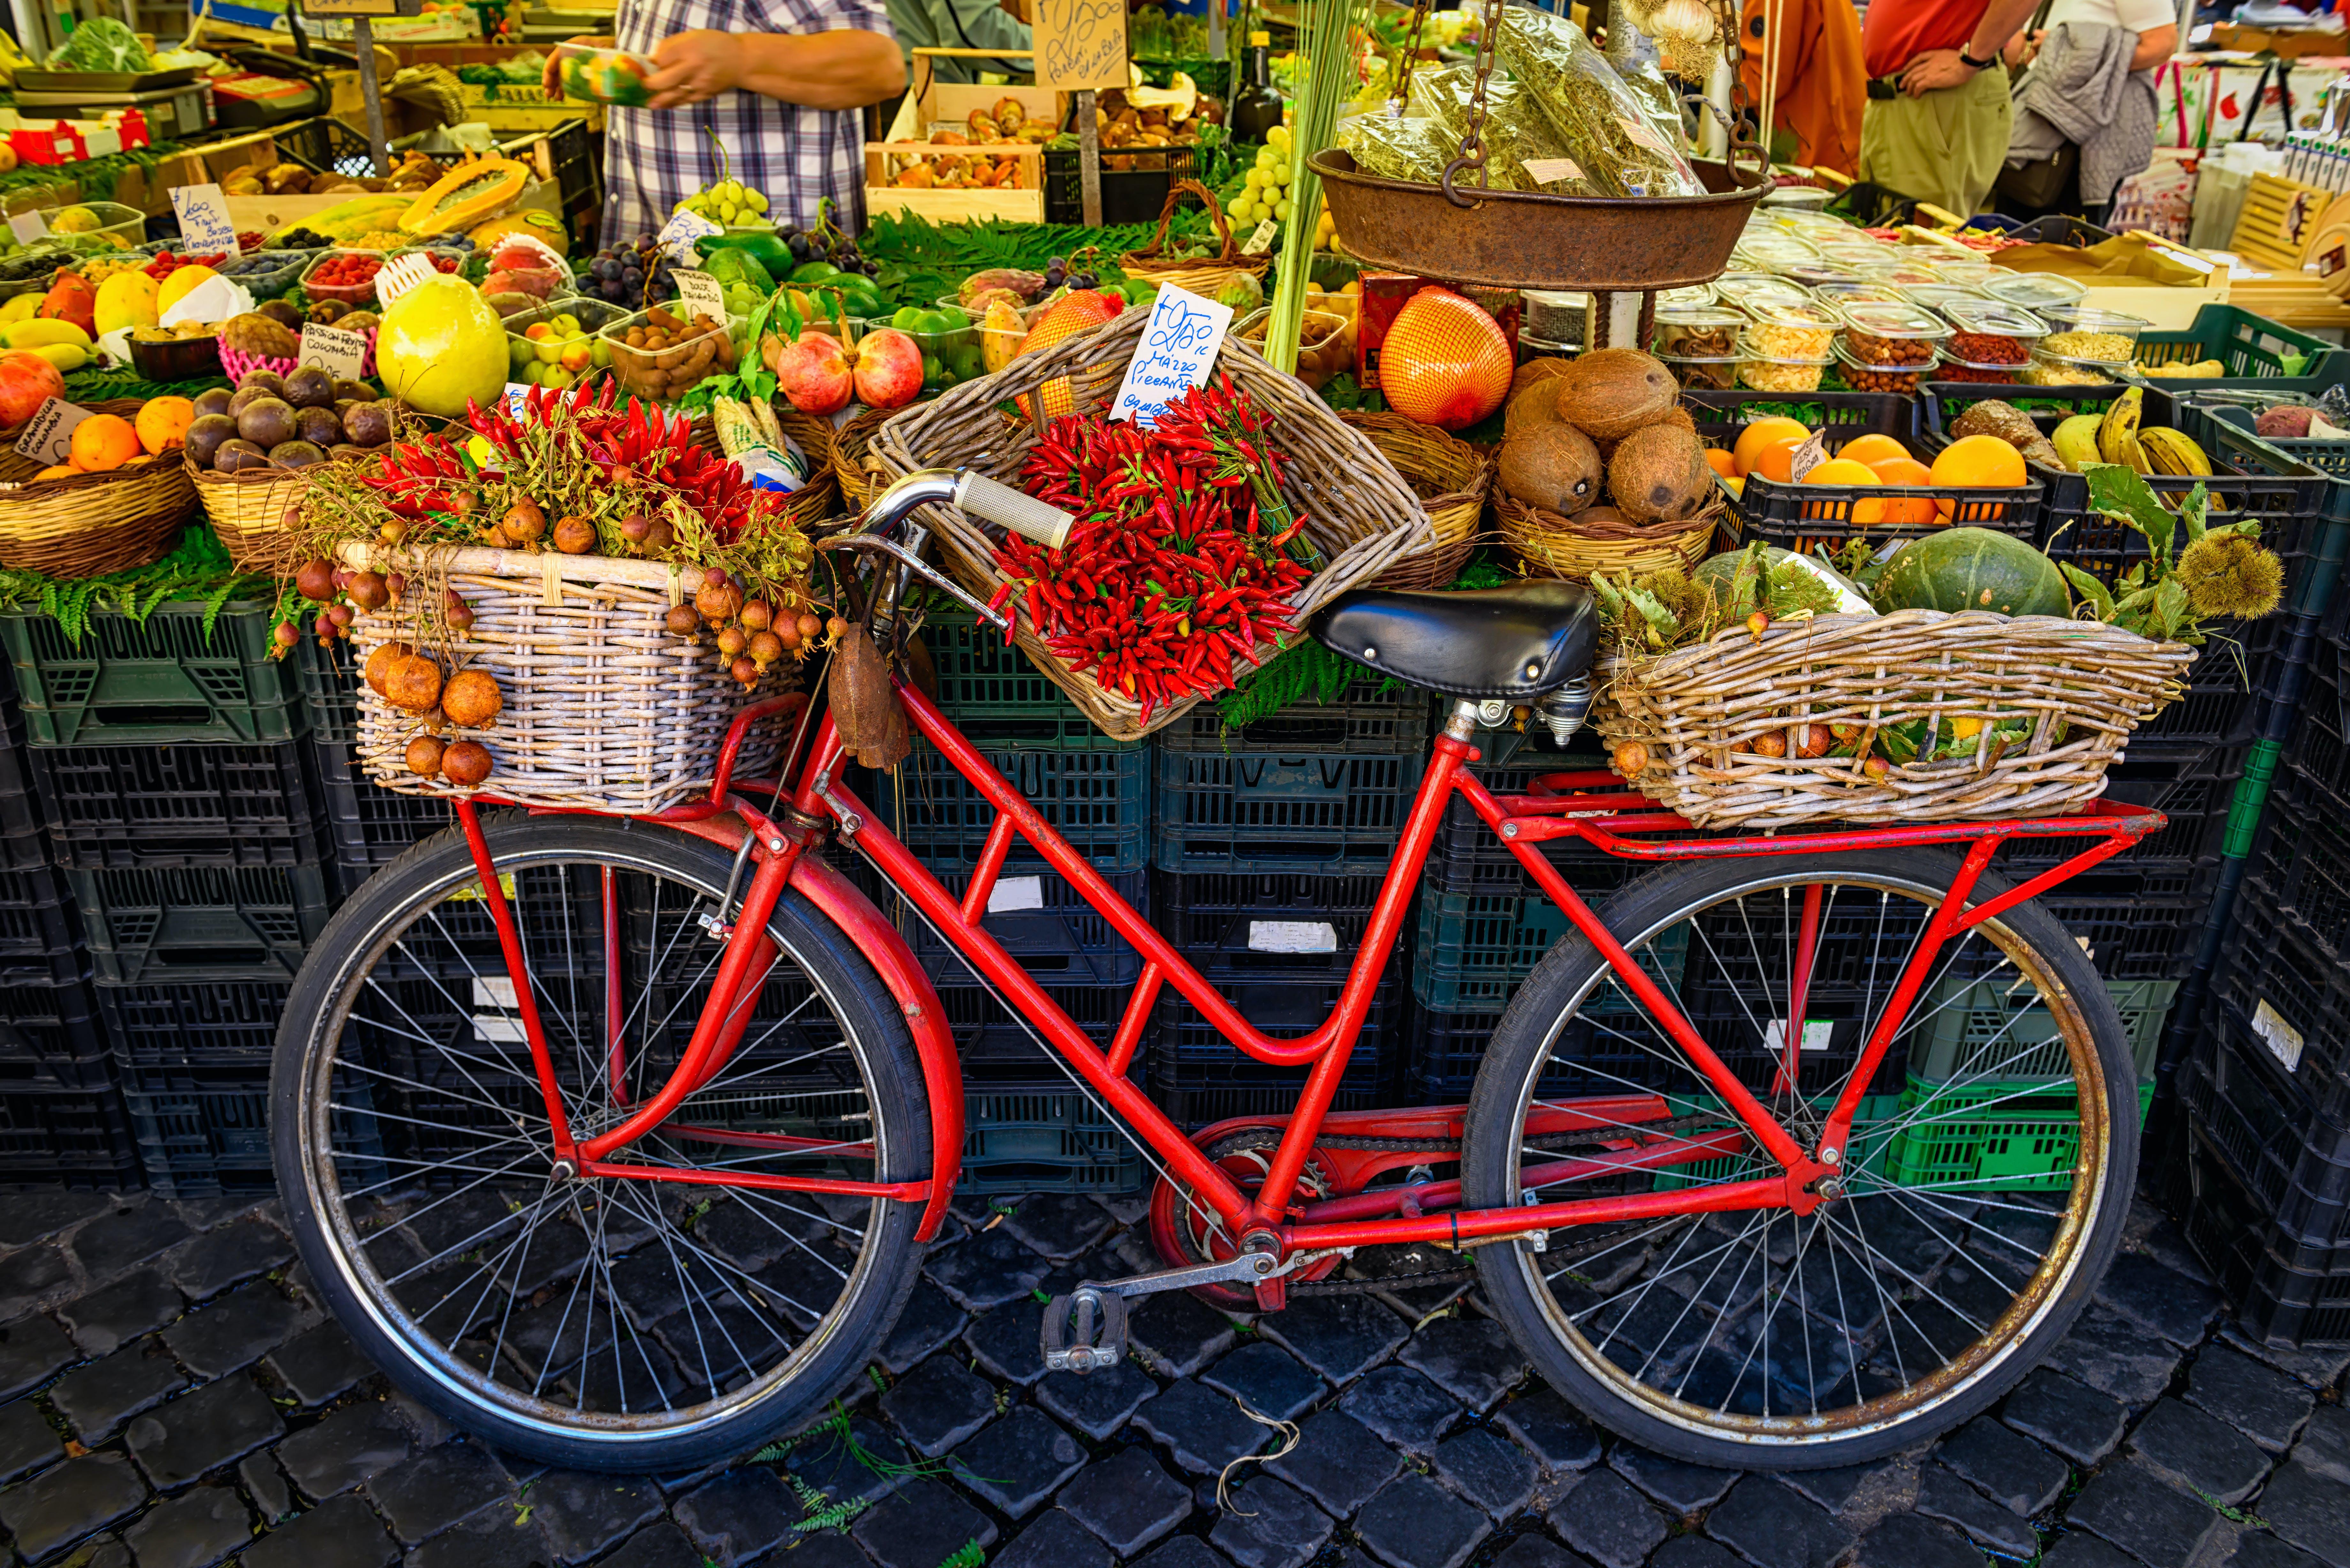 Farmers Market in Rome, Italy